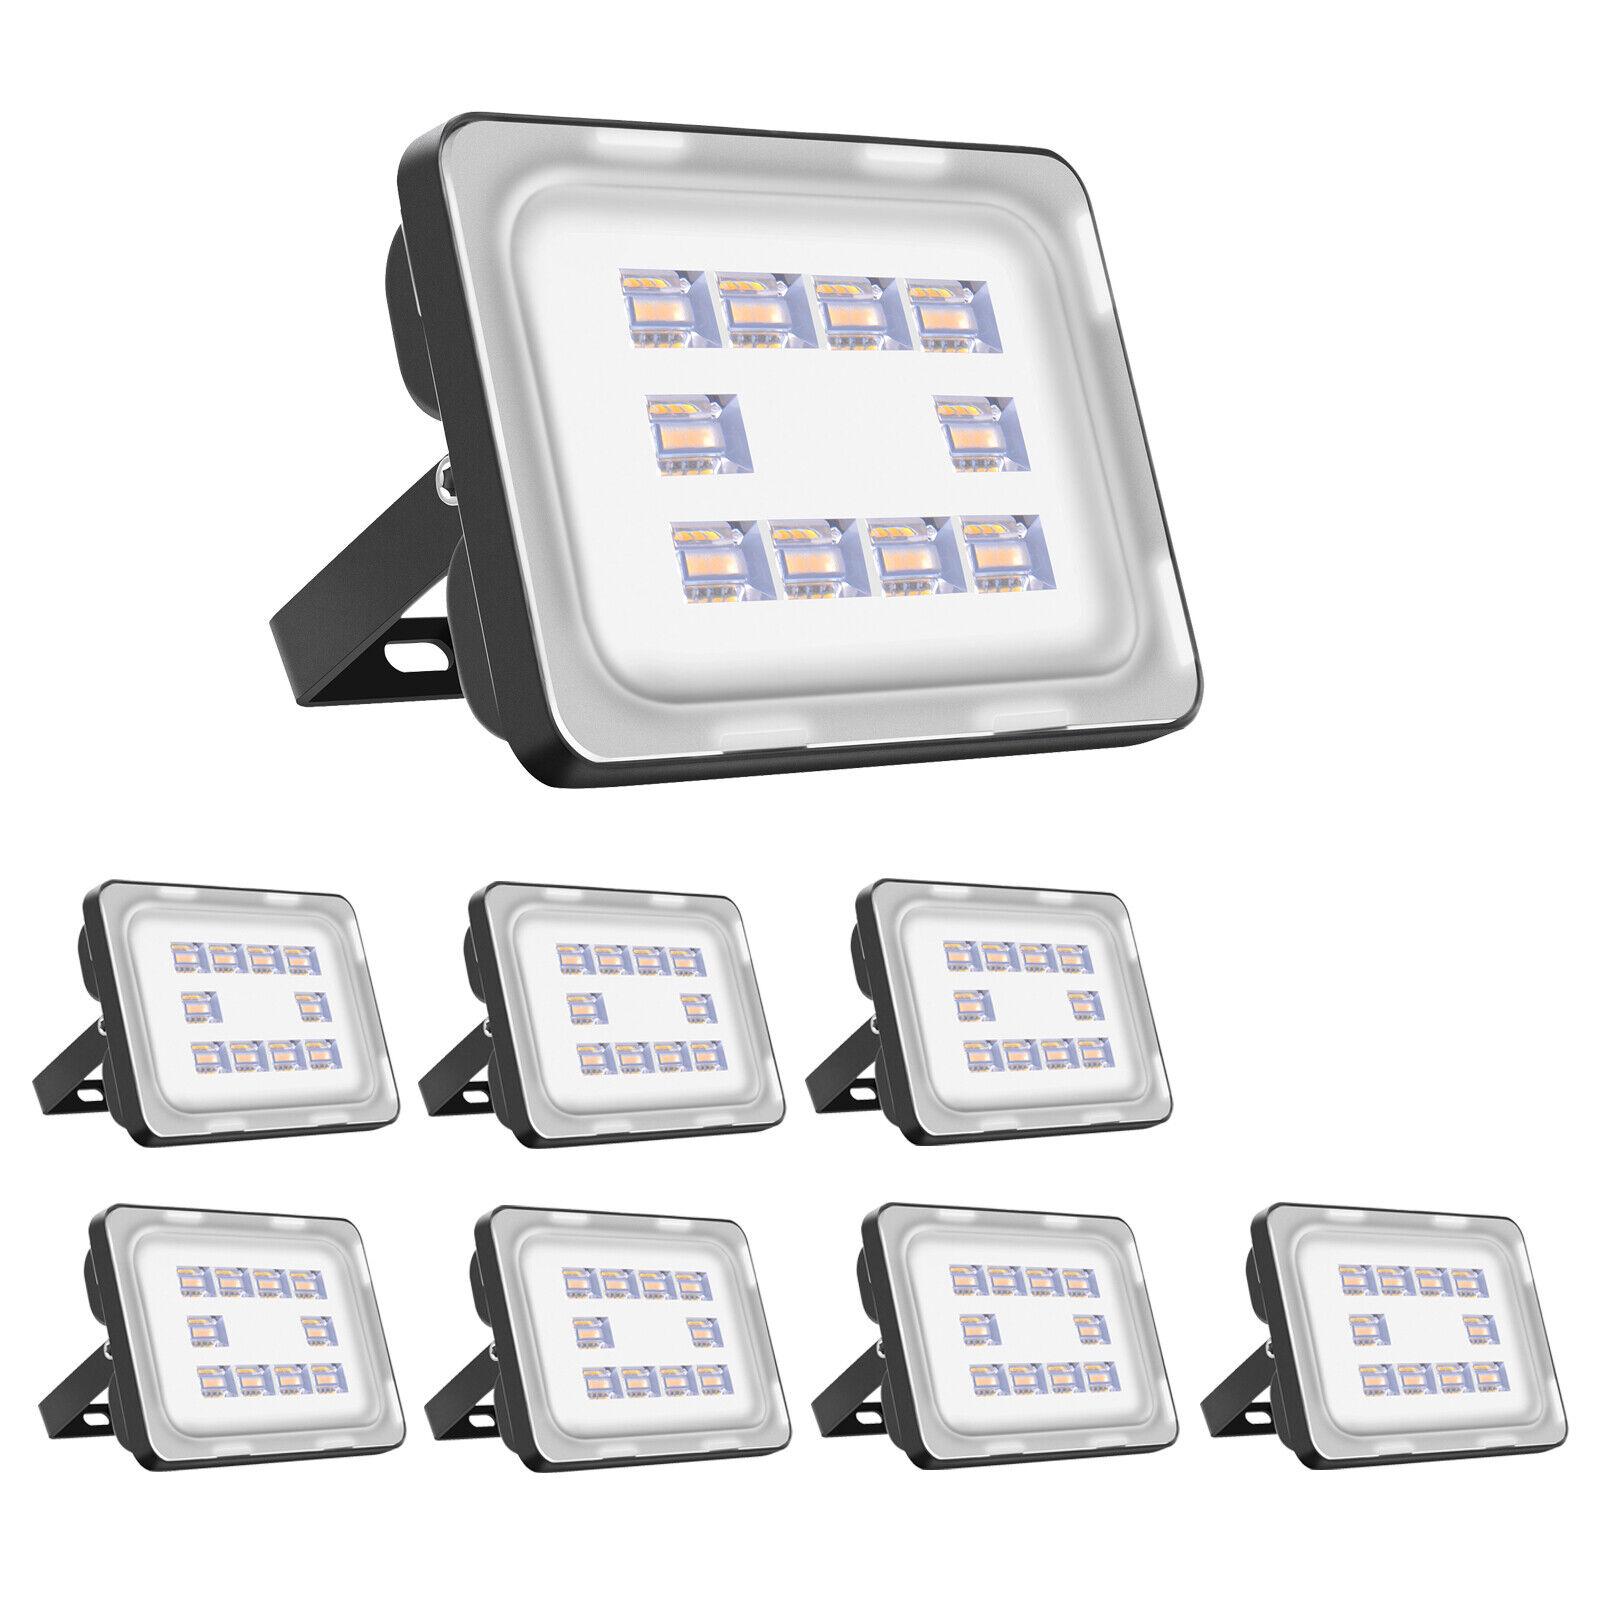 8x30w LED emisor eh blancoo cálido reflector colocado exterior bombilla de faro luz ip65